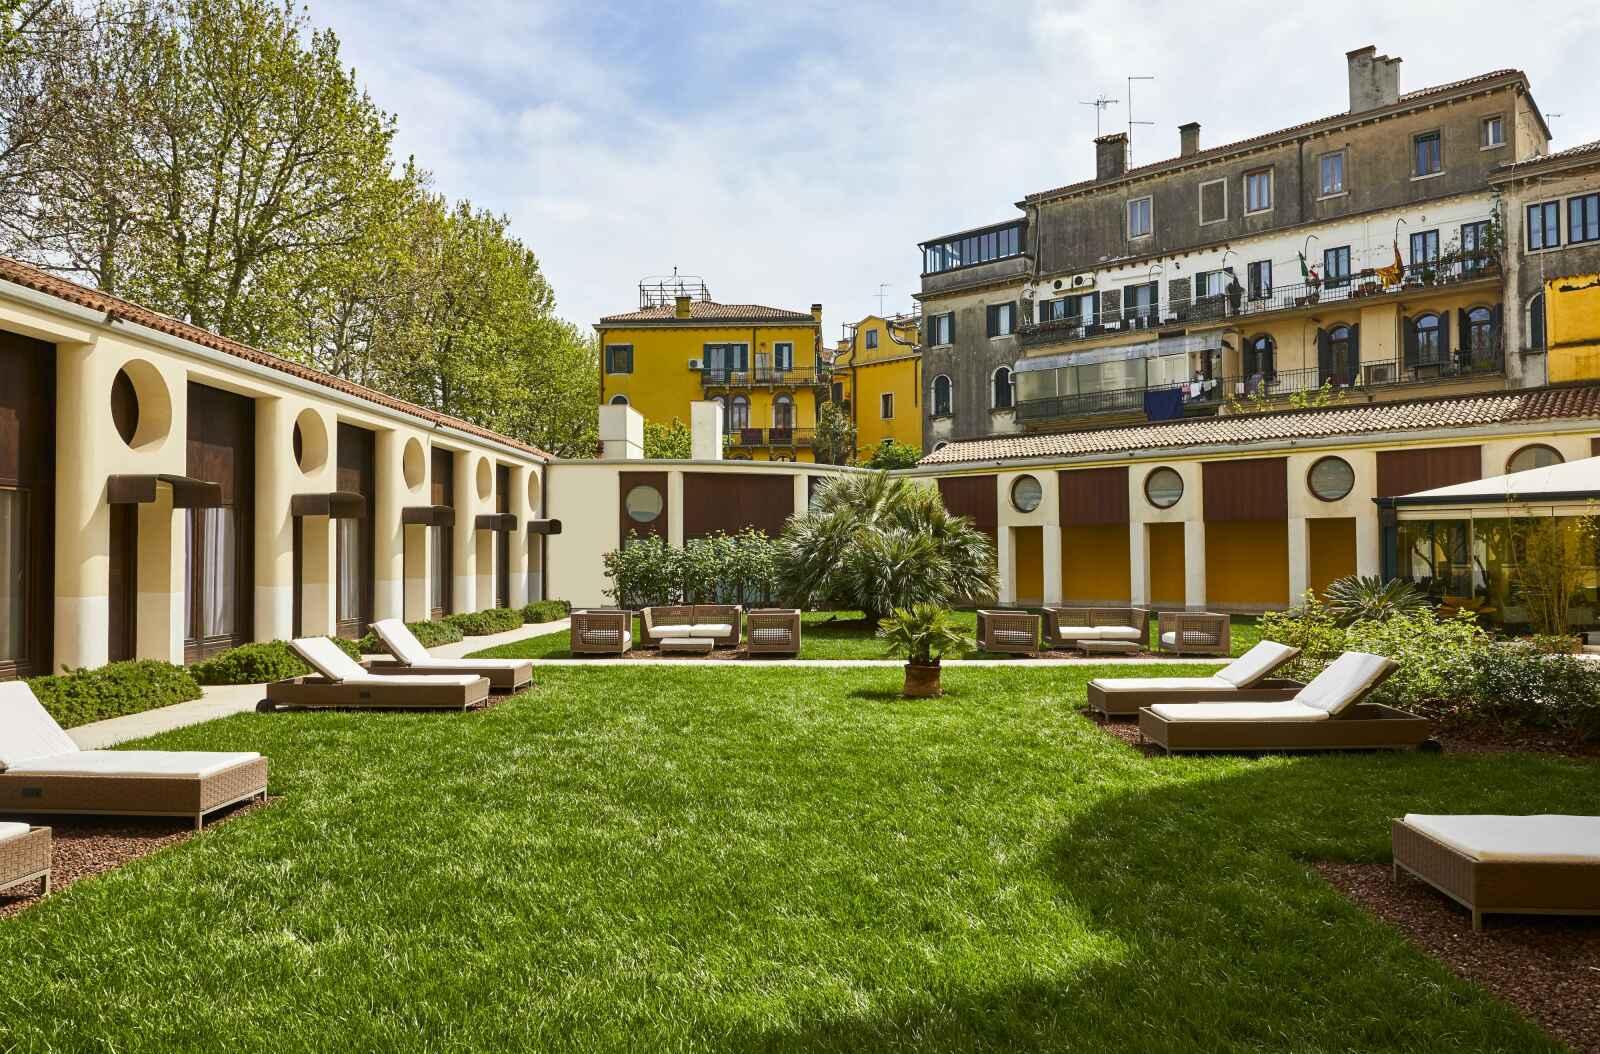 Séjour Vénétie - Hotel Indigo Venice - Sant'Elena - 4*